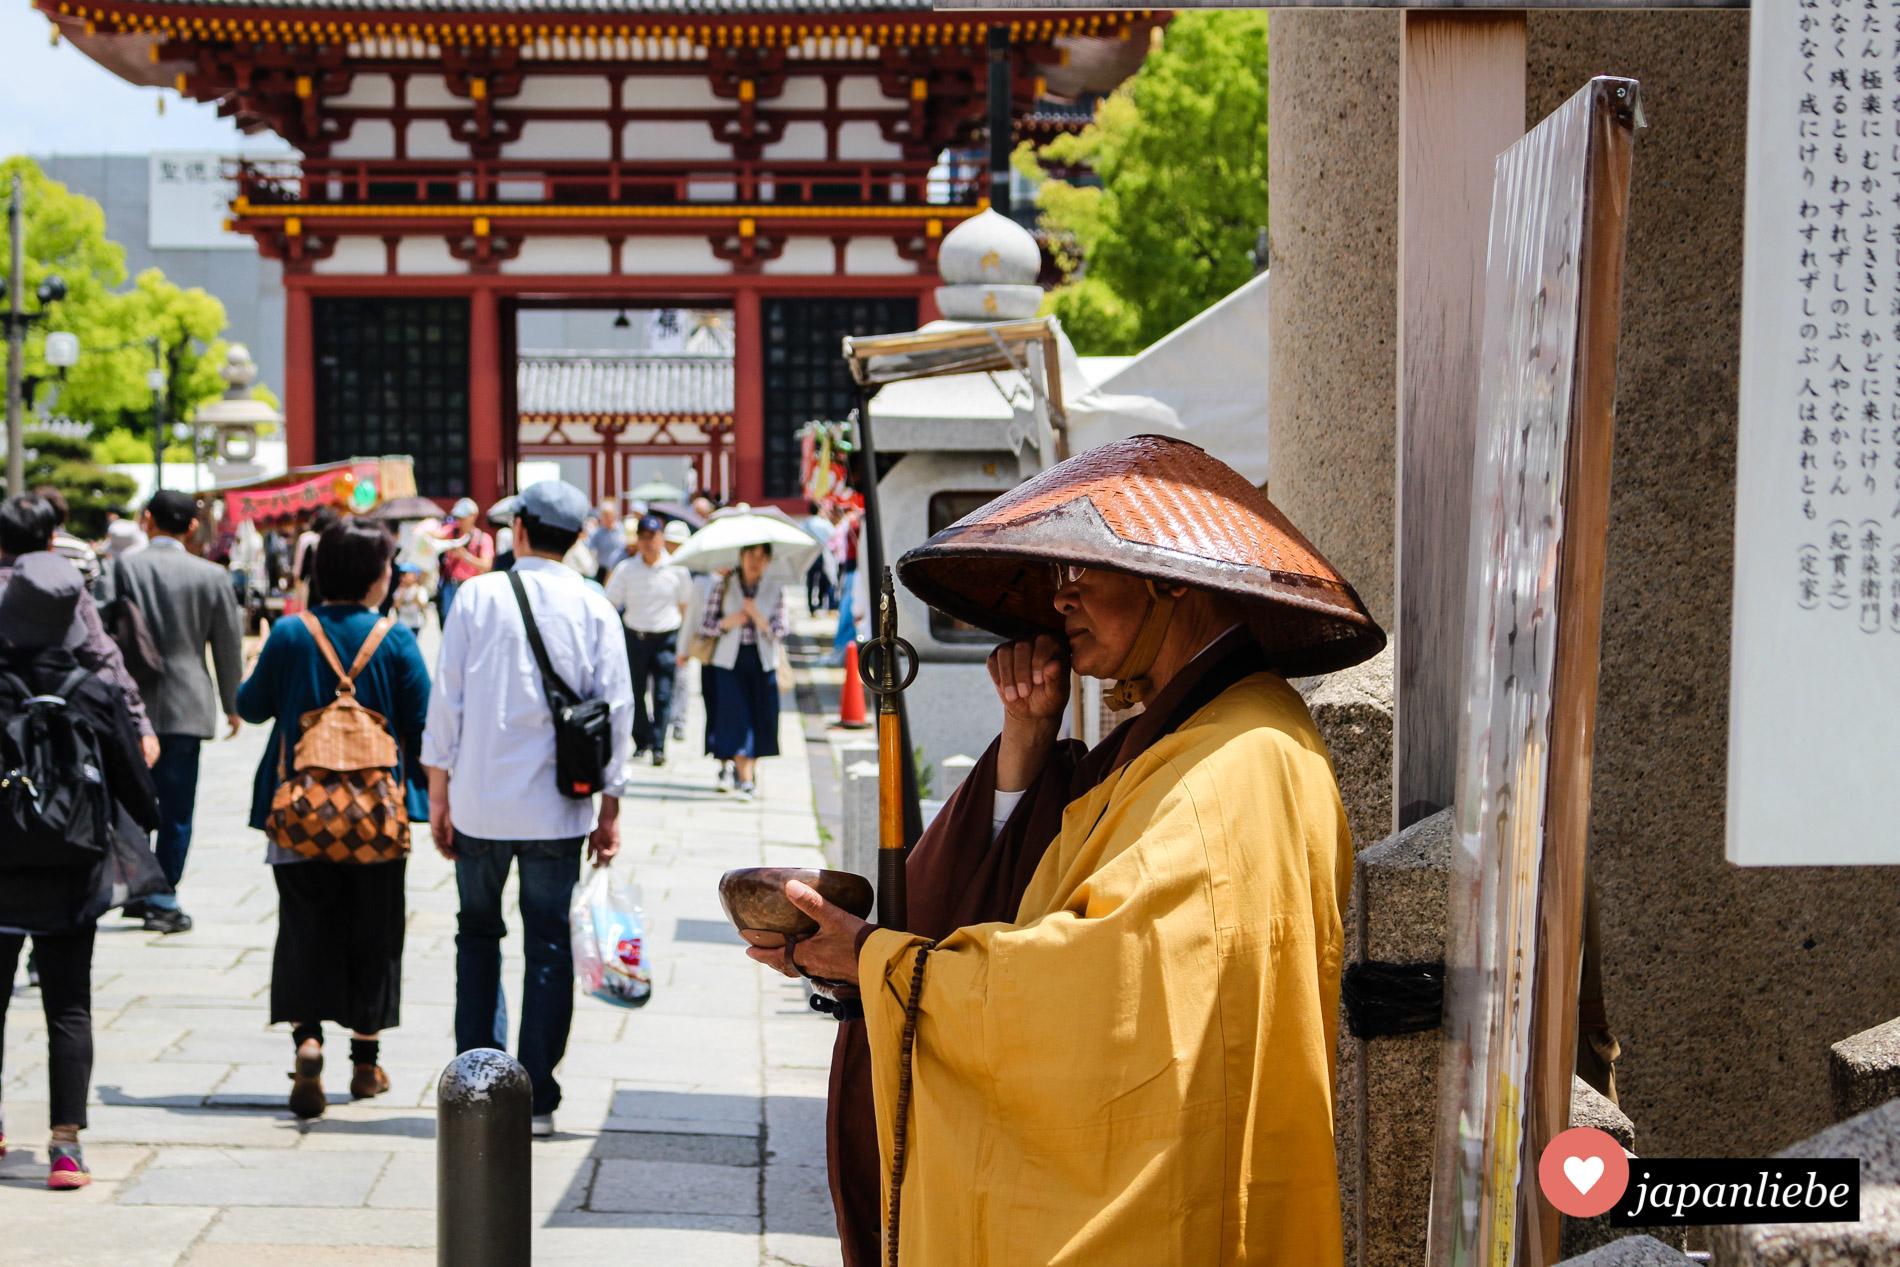 Ein Bettelmönch am Shitennō-ji-Tempel in Ōsaka.